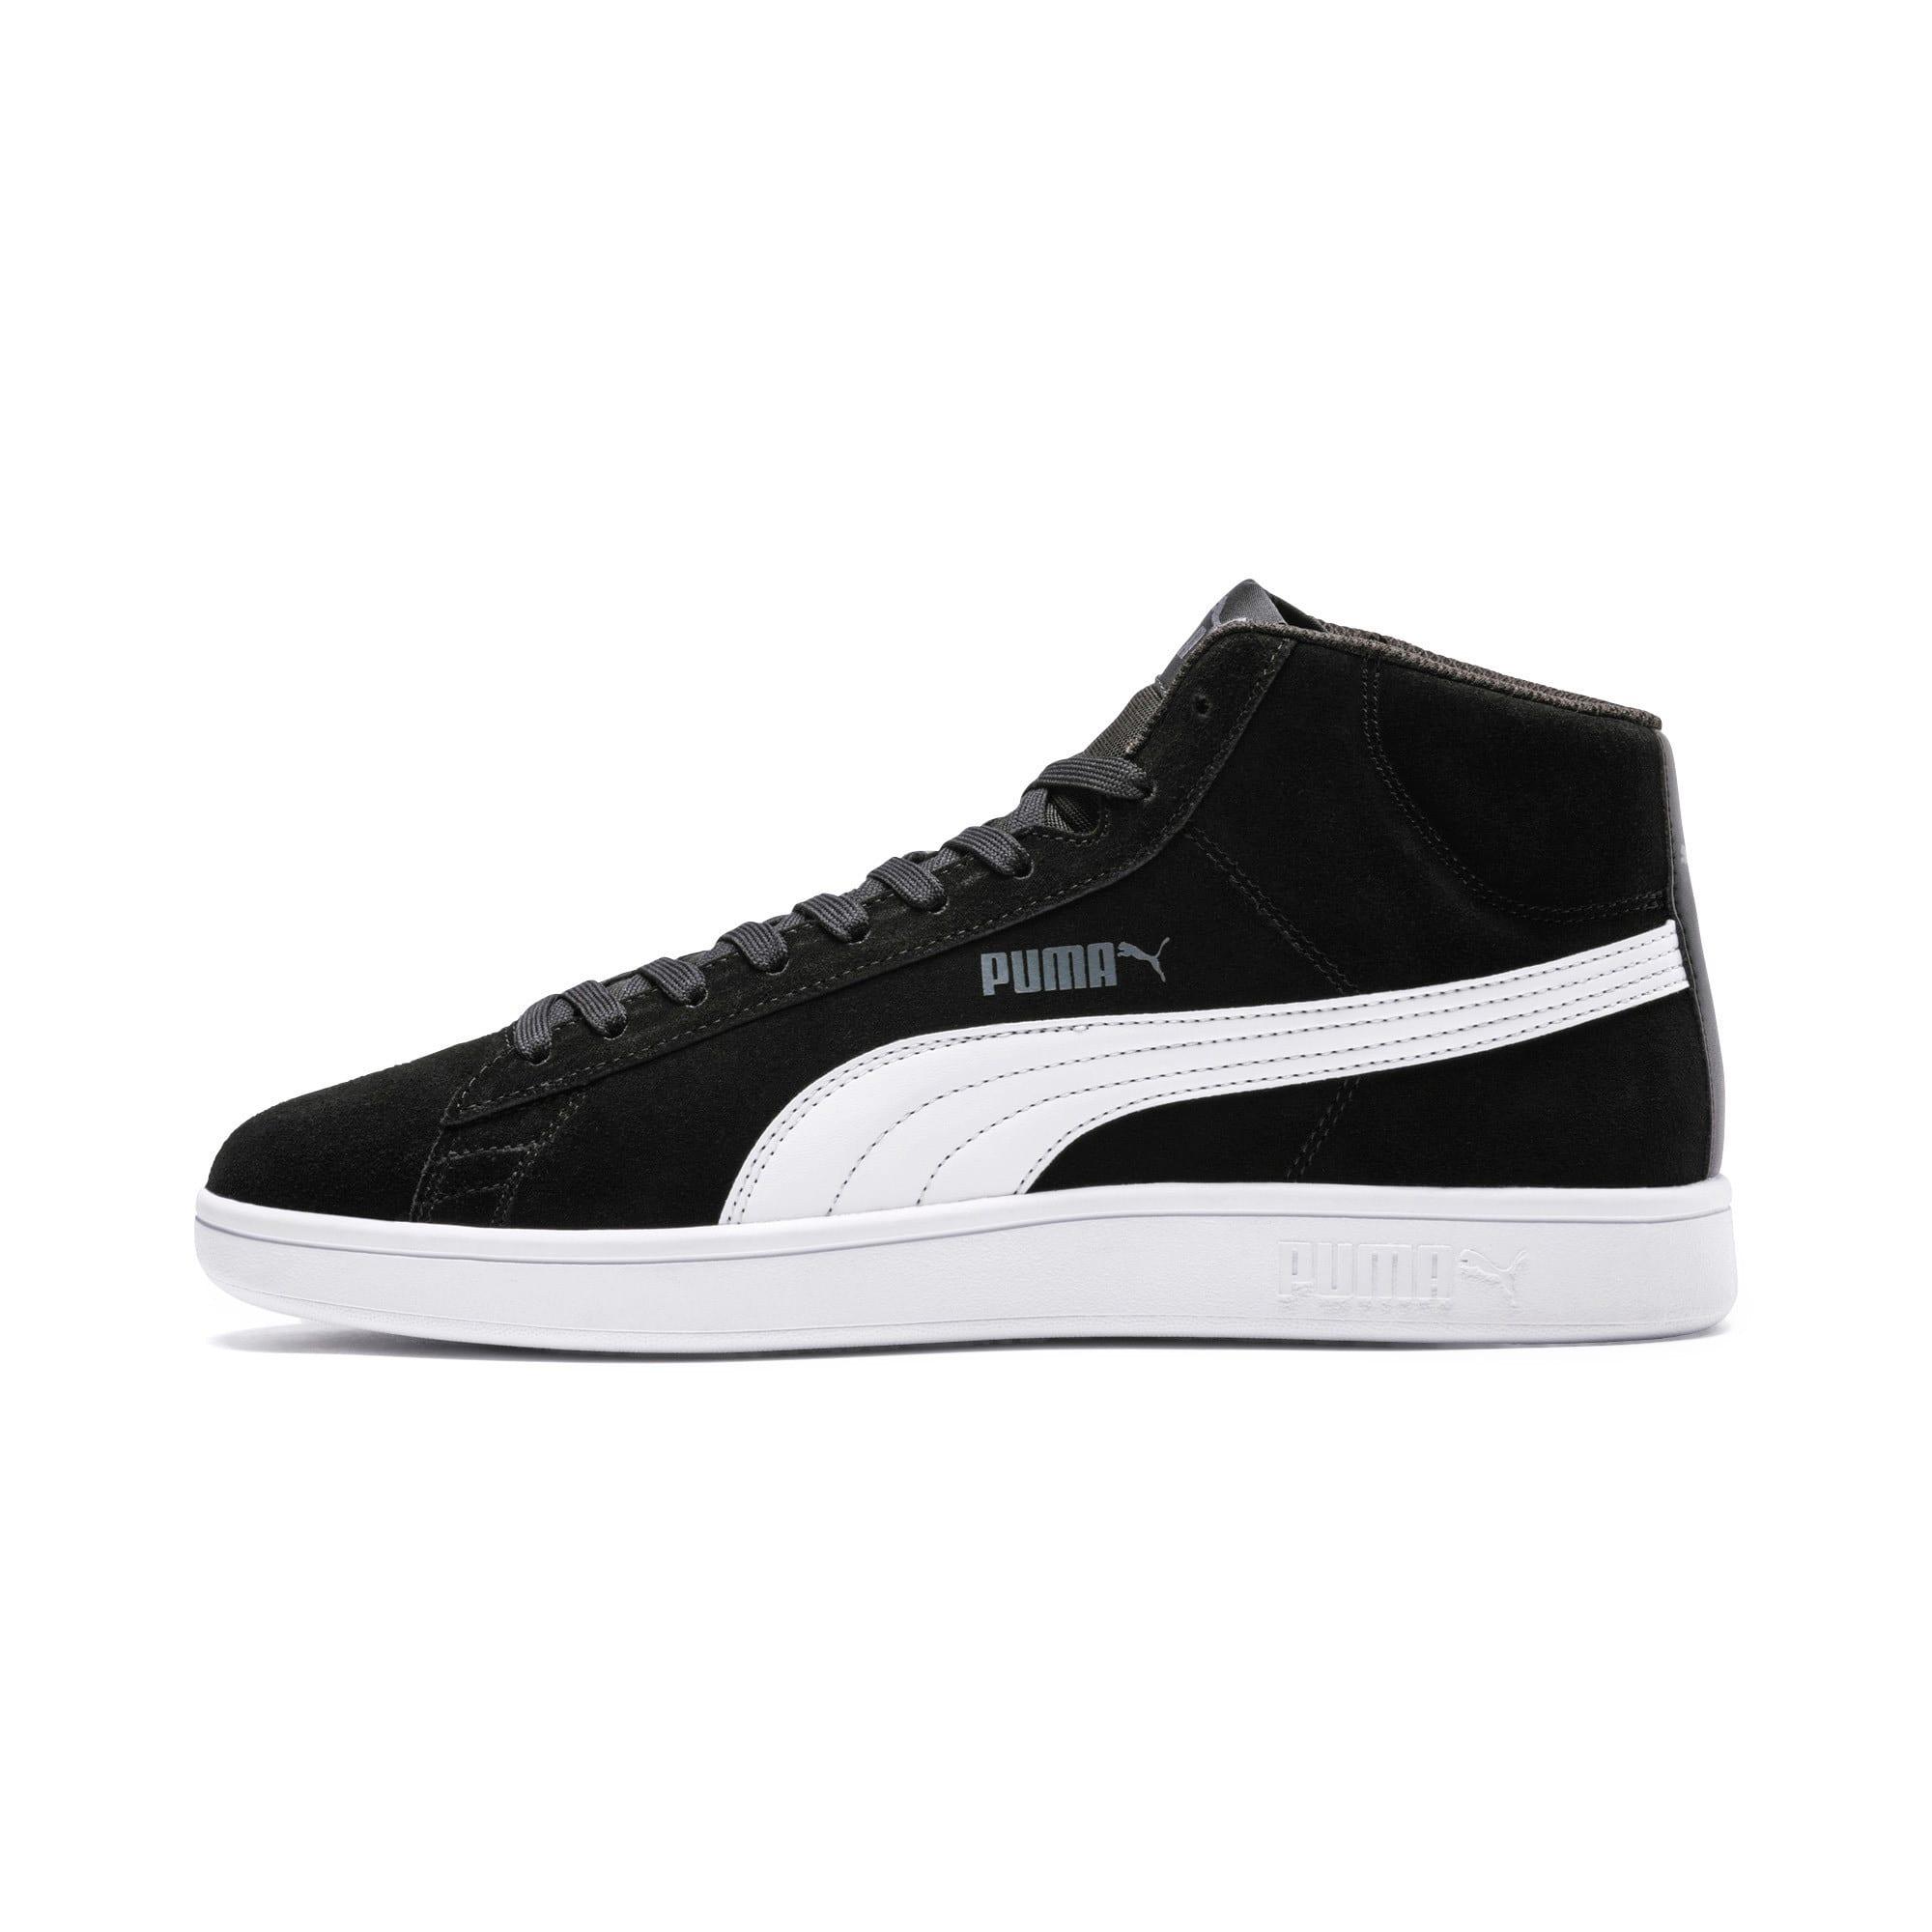 official photos 0dc16 1b8a1 PUMA Smash v2 Suede Mid Sneakers